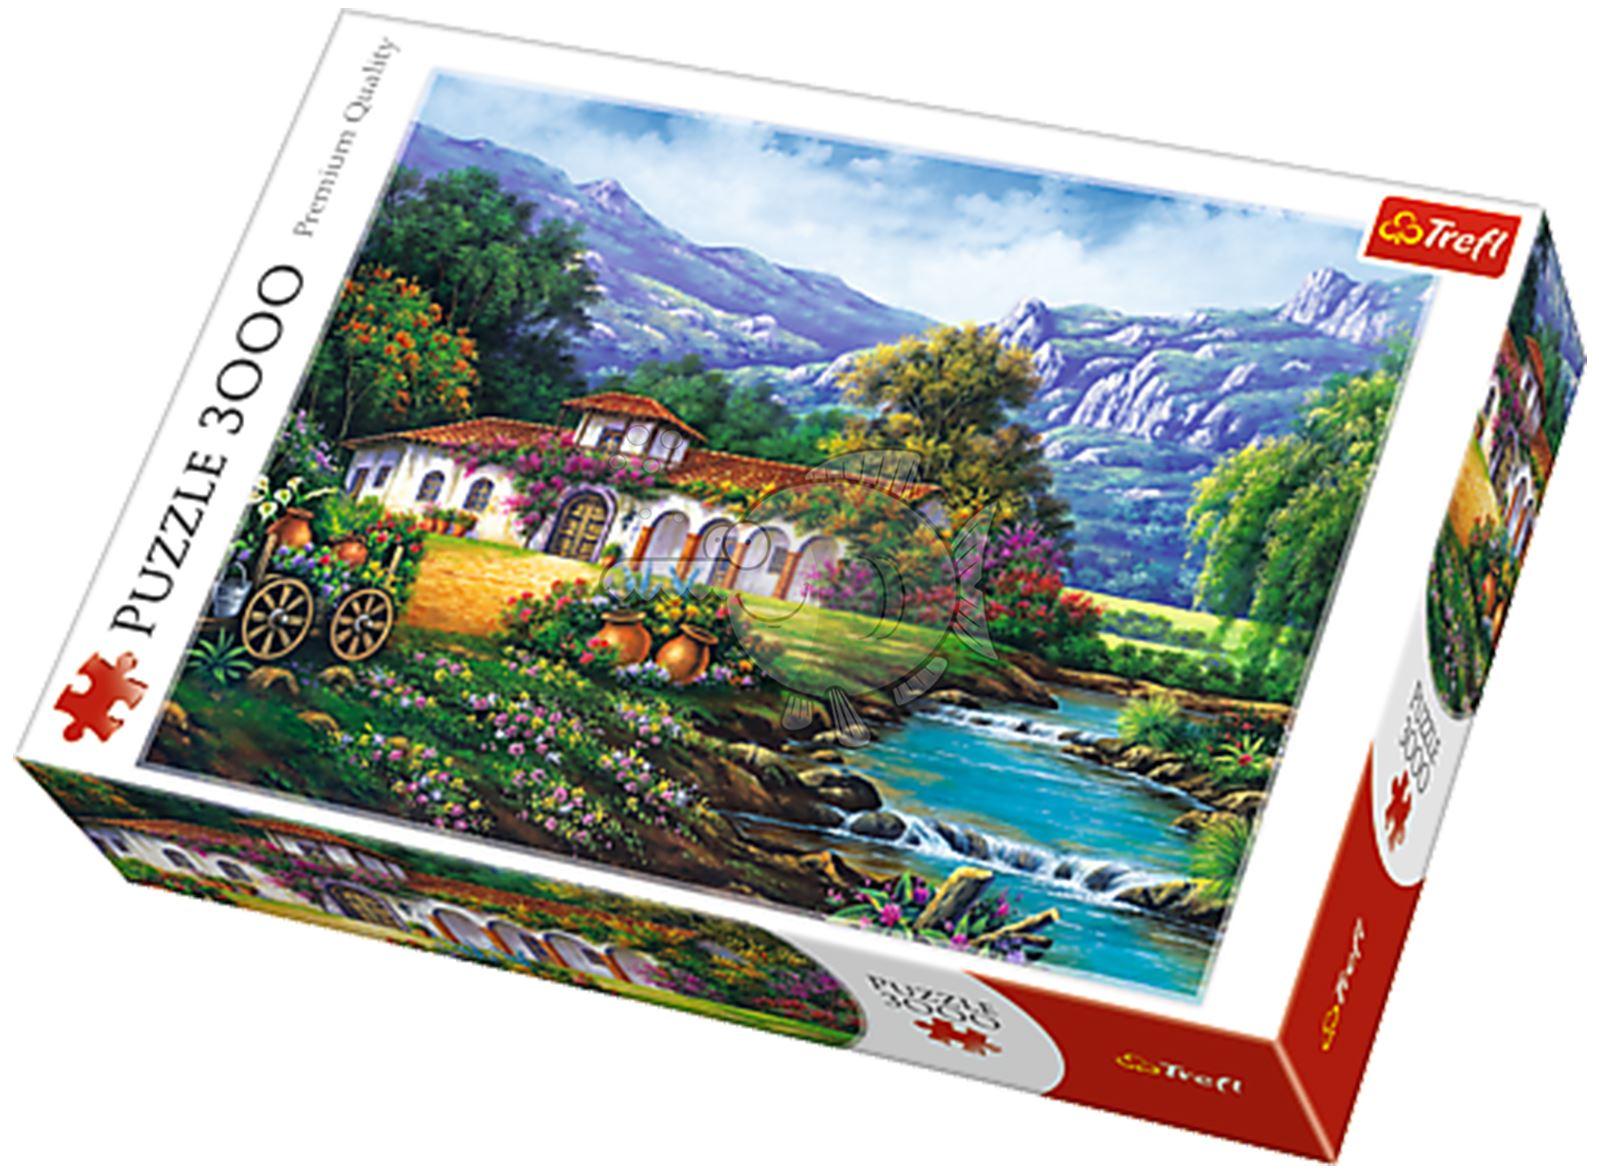 Trefl-300-500-1000-1500-2000-3000-4000-6000-Piece-Jigsaw-Puzzle-Landscapes-City thumbnail 154